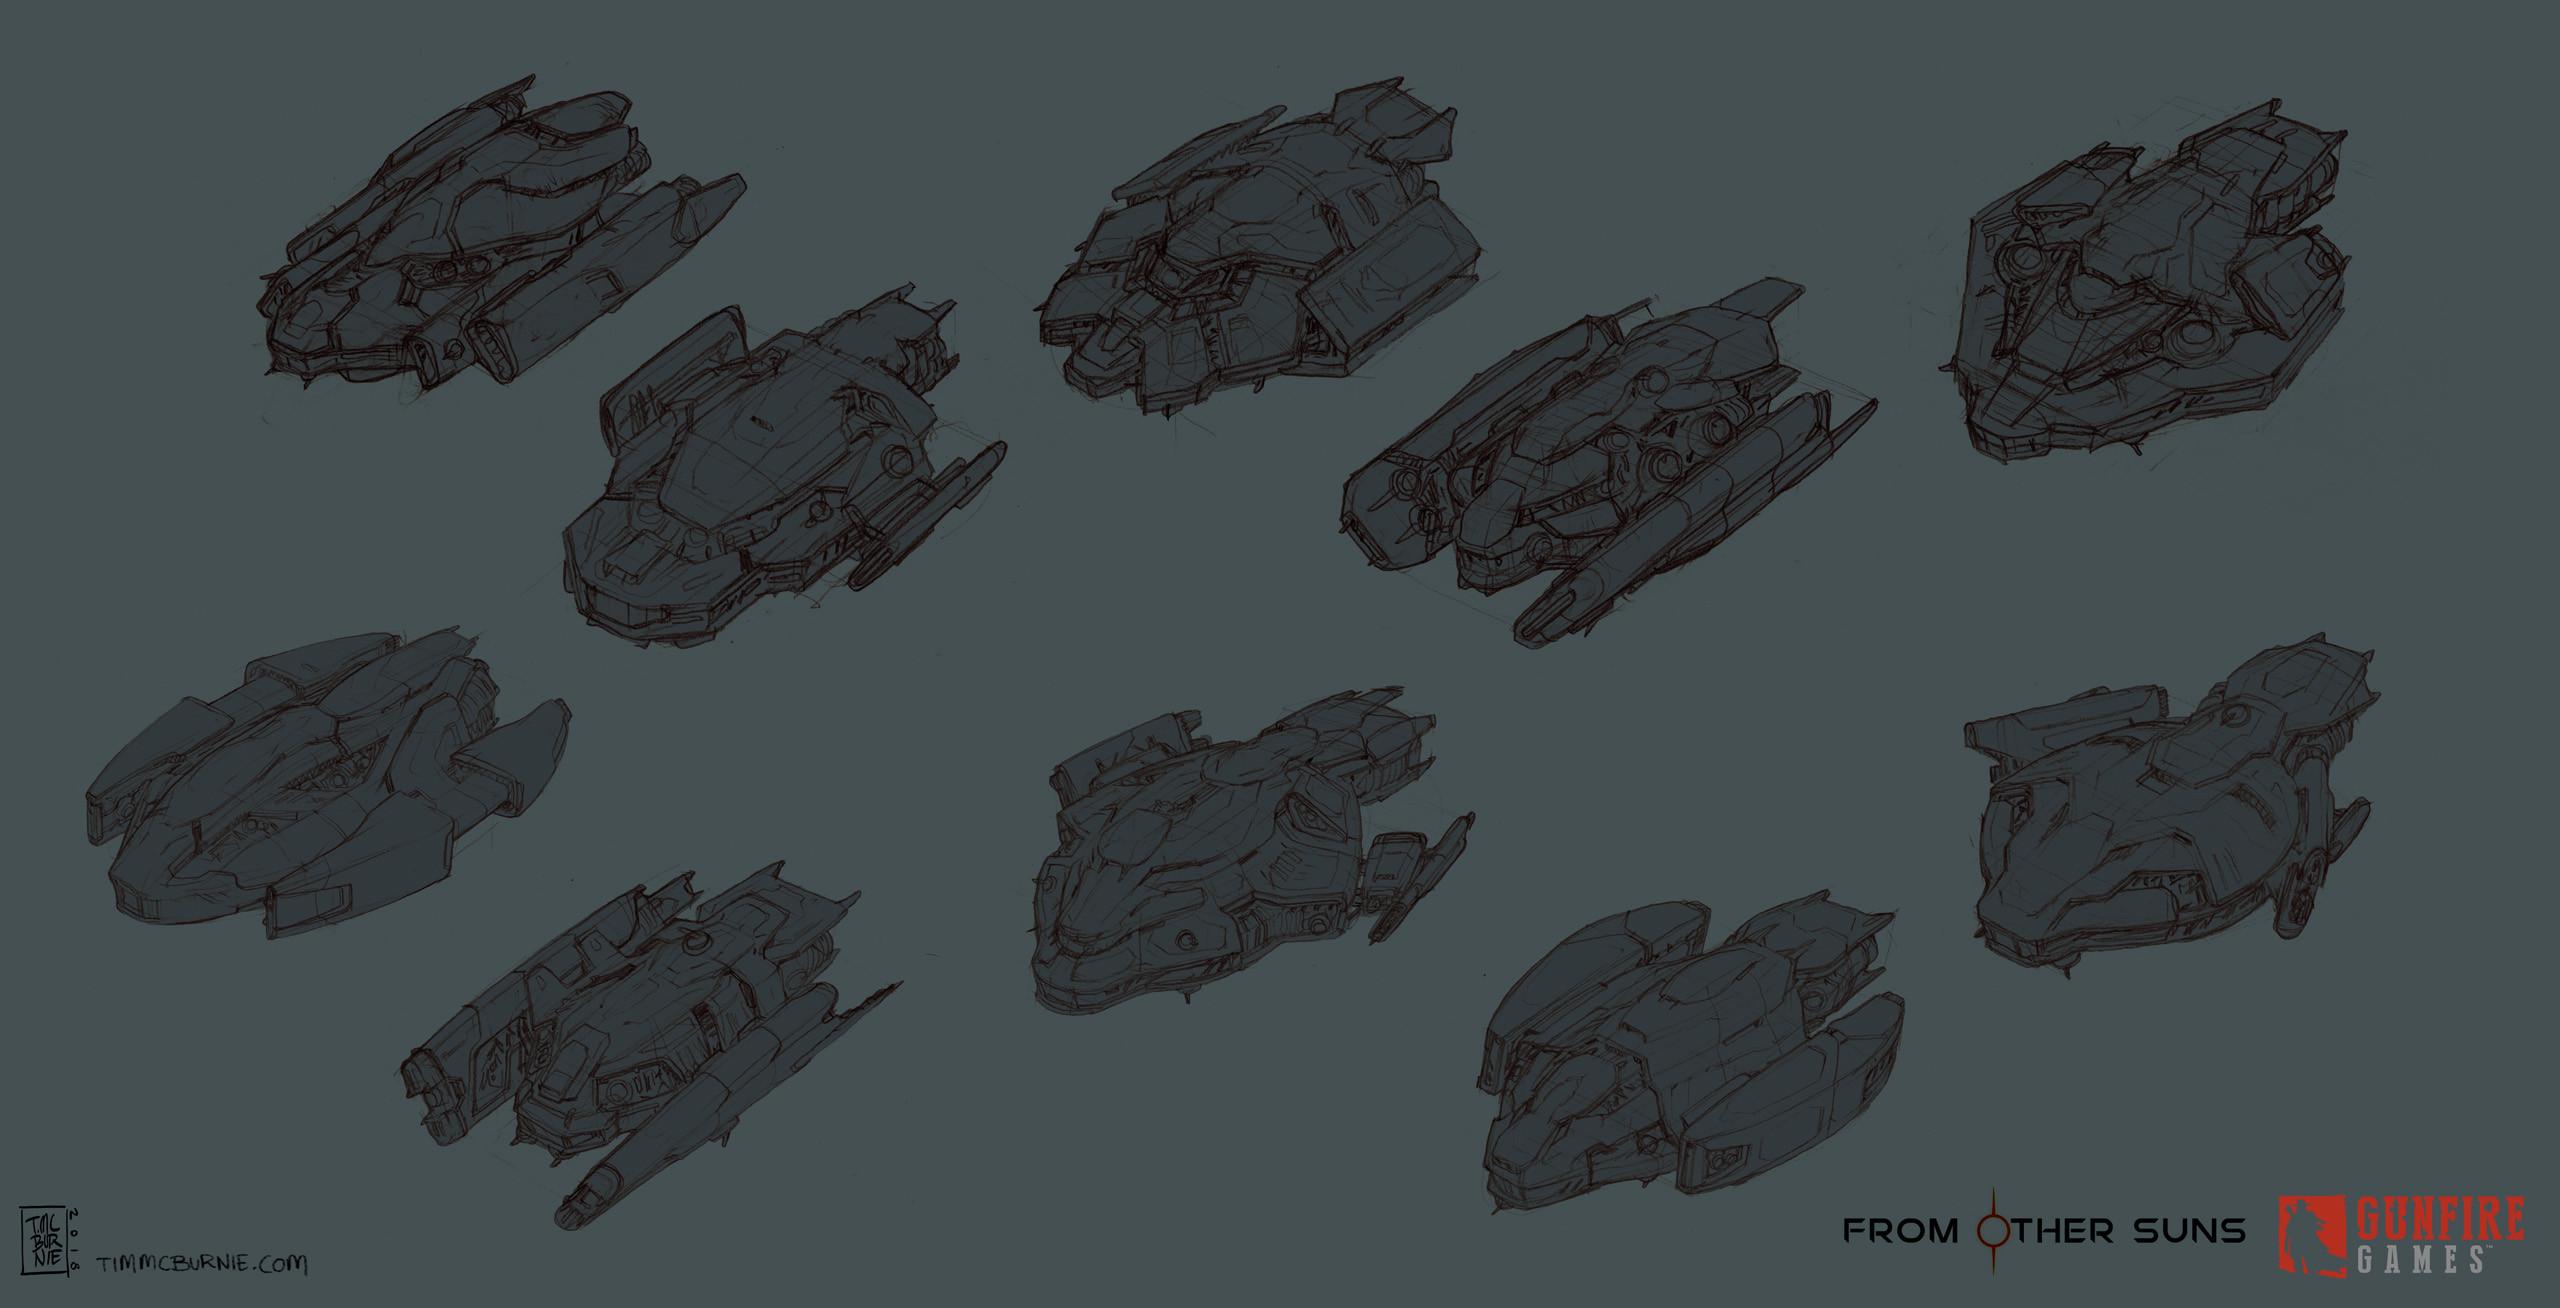 Player Ship sketches